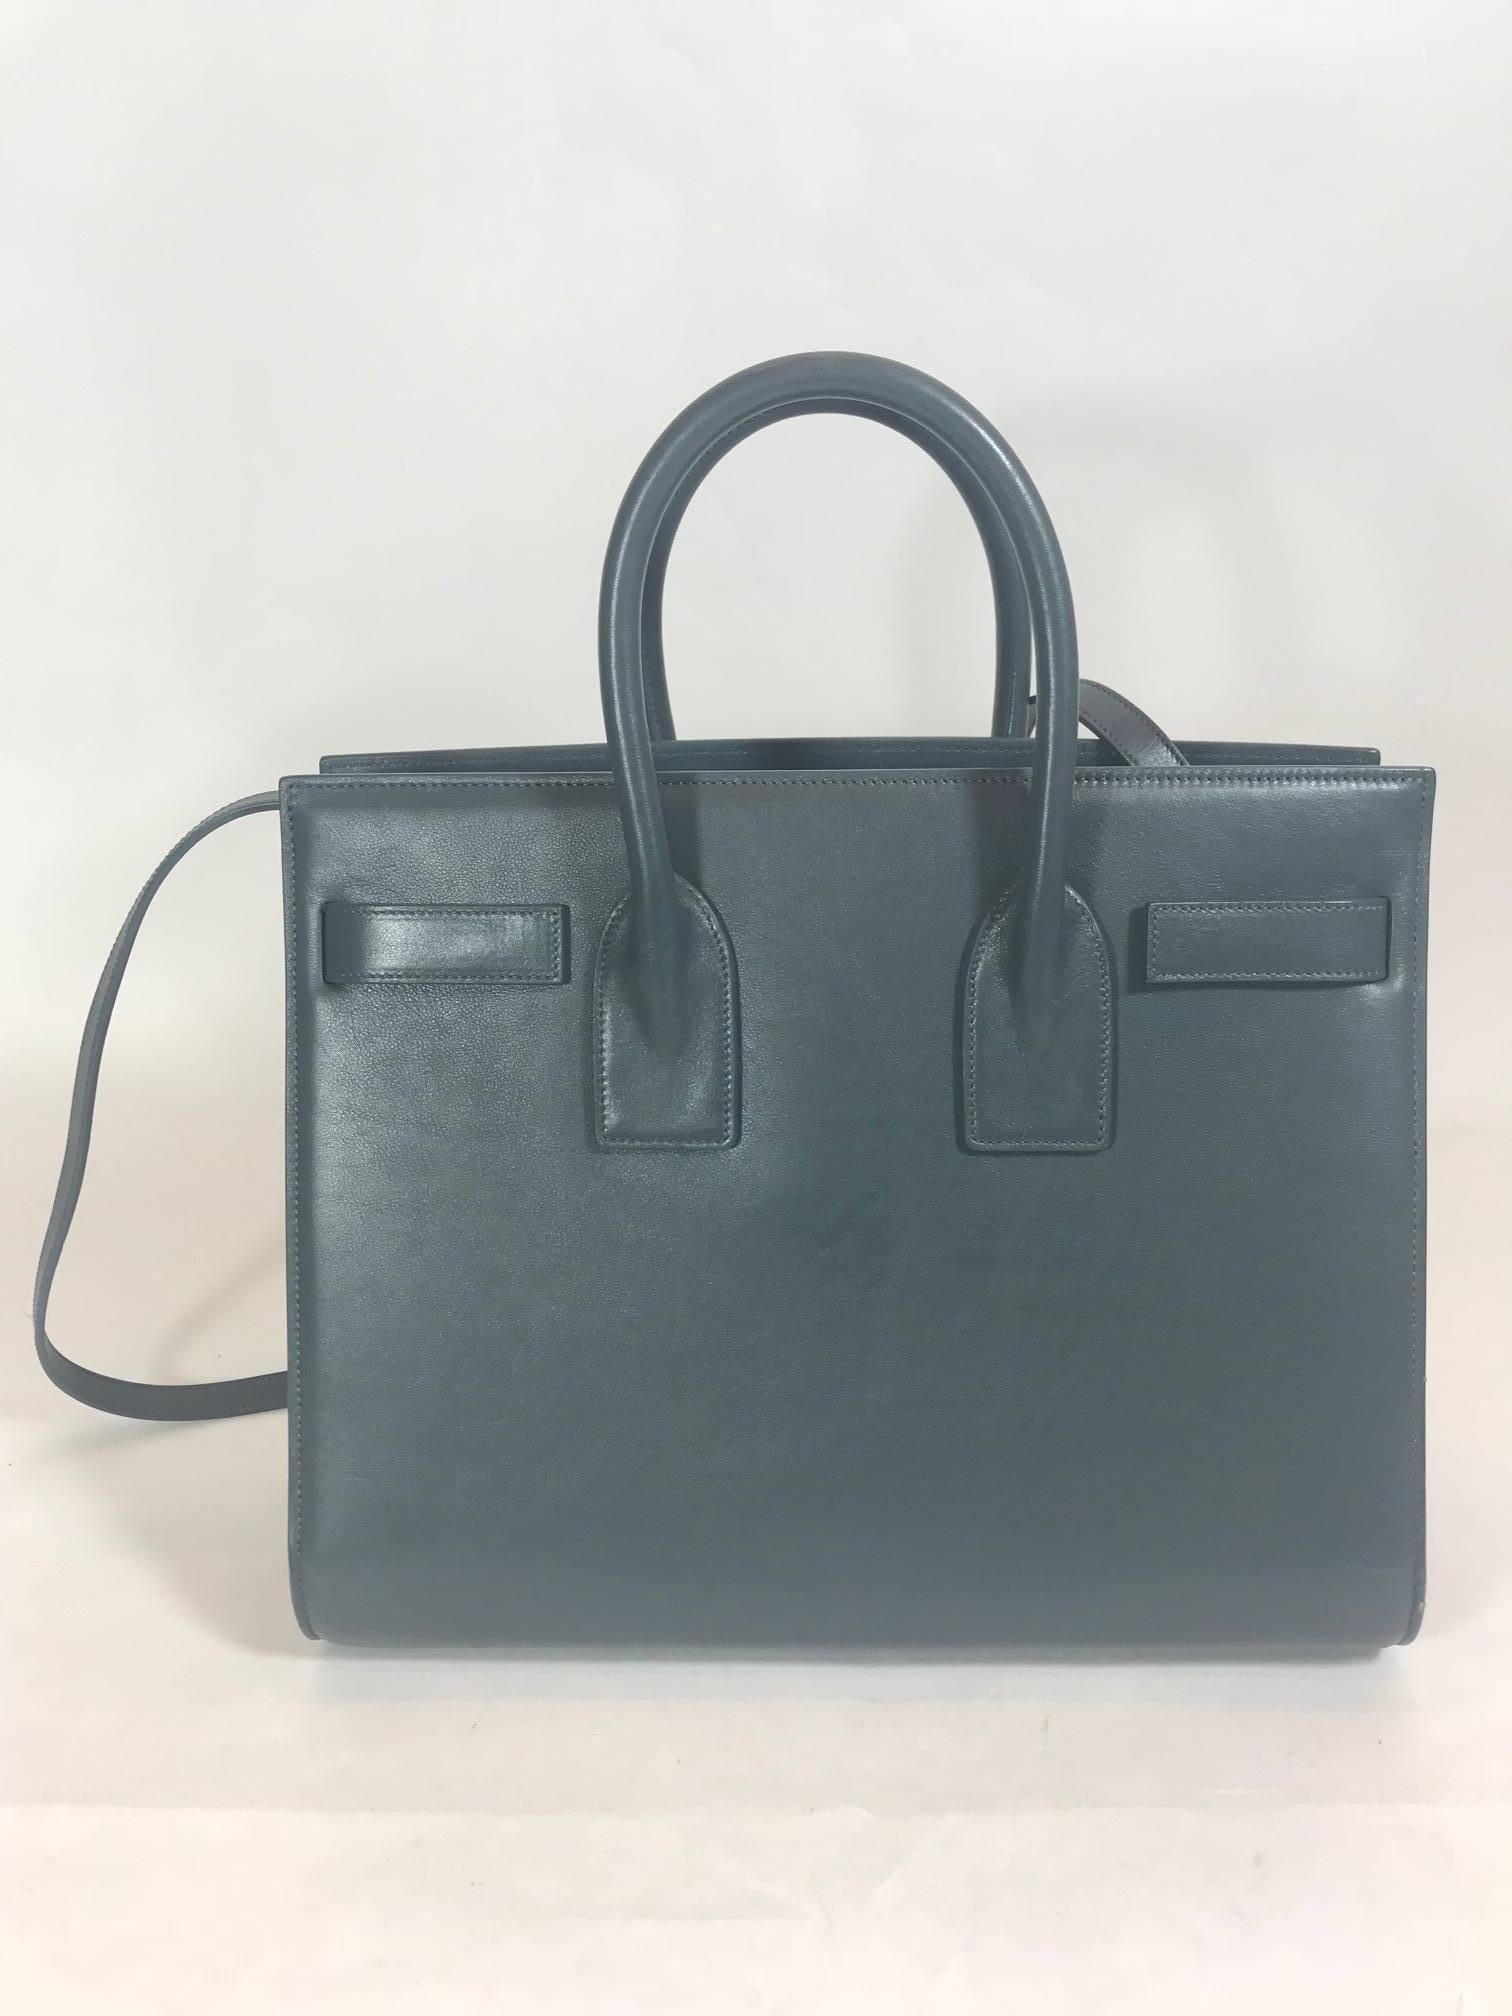 5856d7766c Saint Laurent Classic Small Sac De Jour Bag In Petrol Leather For Sale at  1stdibs